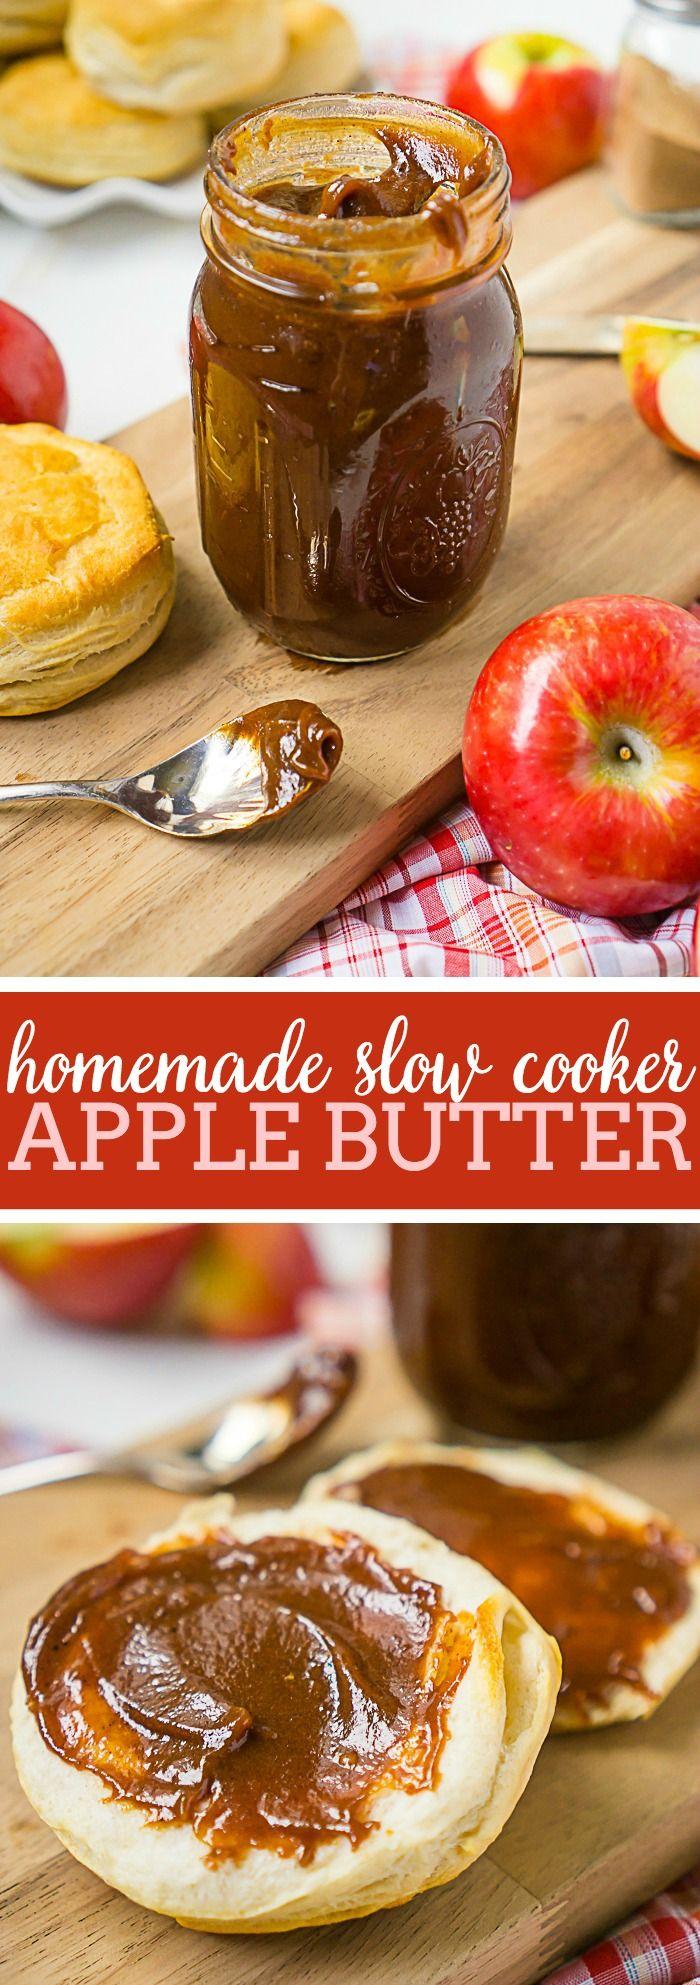 Homemade Apple Butter in Slow Cooker Recipe Apple